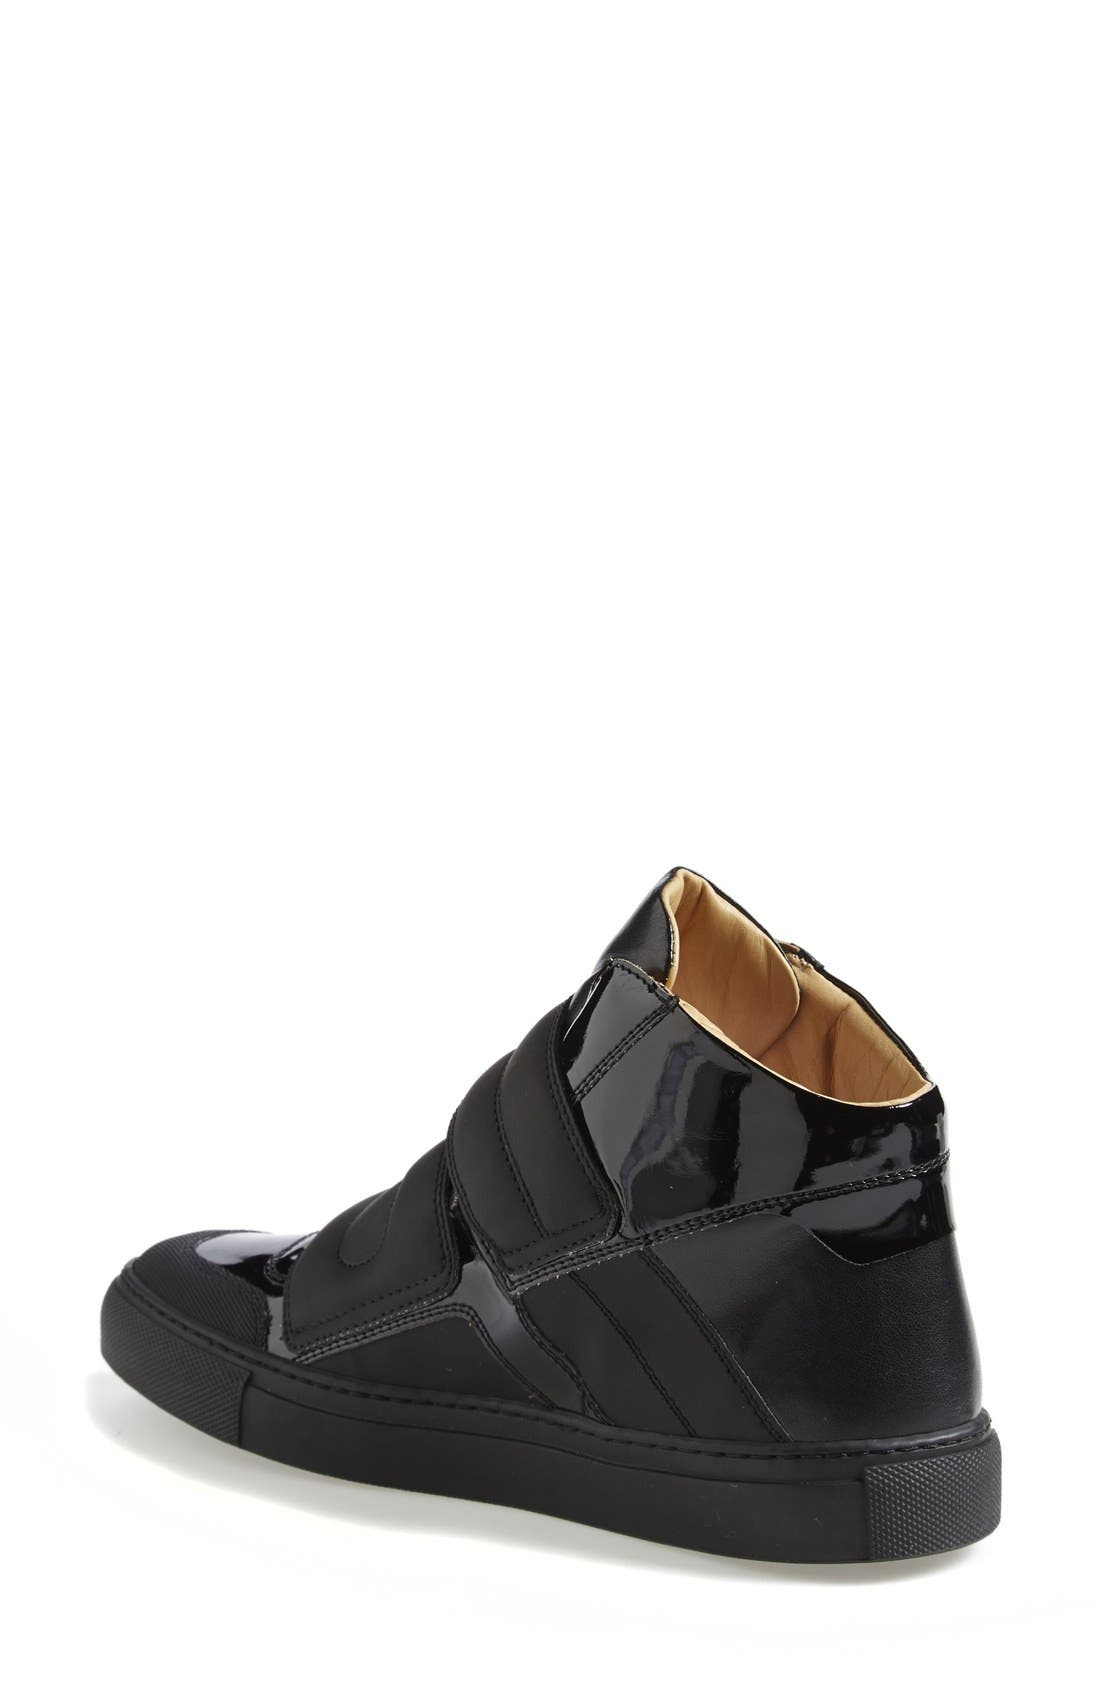 High Top Sneaker,                             Alternate thumbnail 2, color,                             001